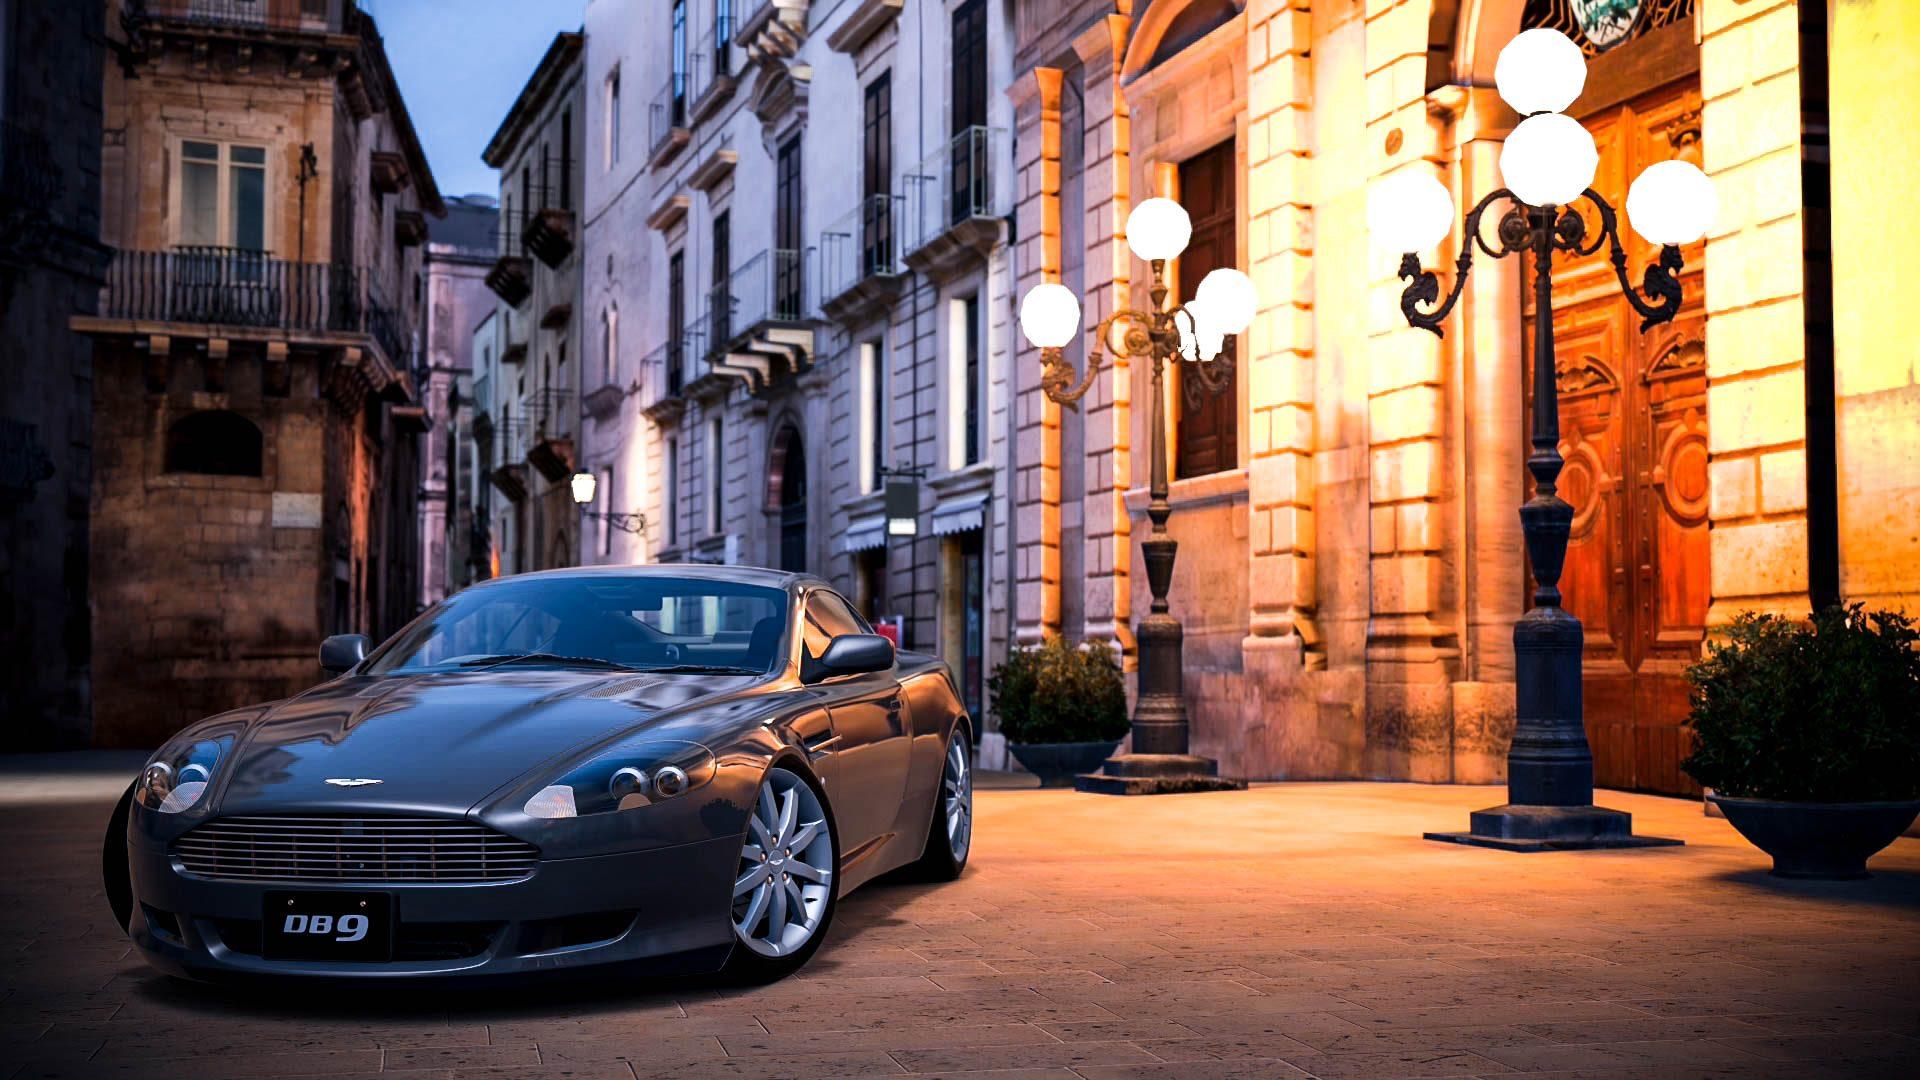 AstonMartin_Italy_1.jpg